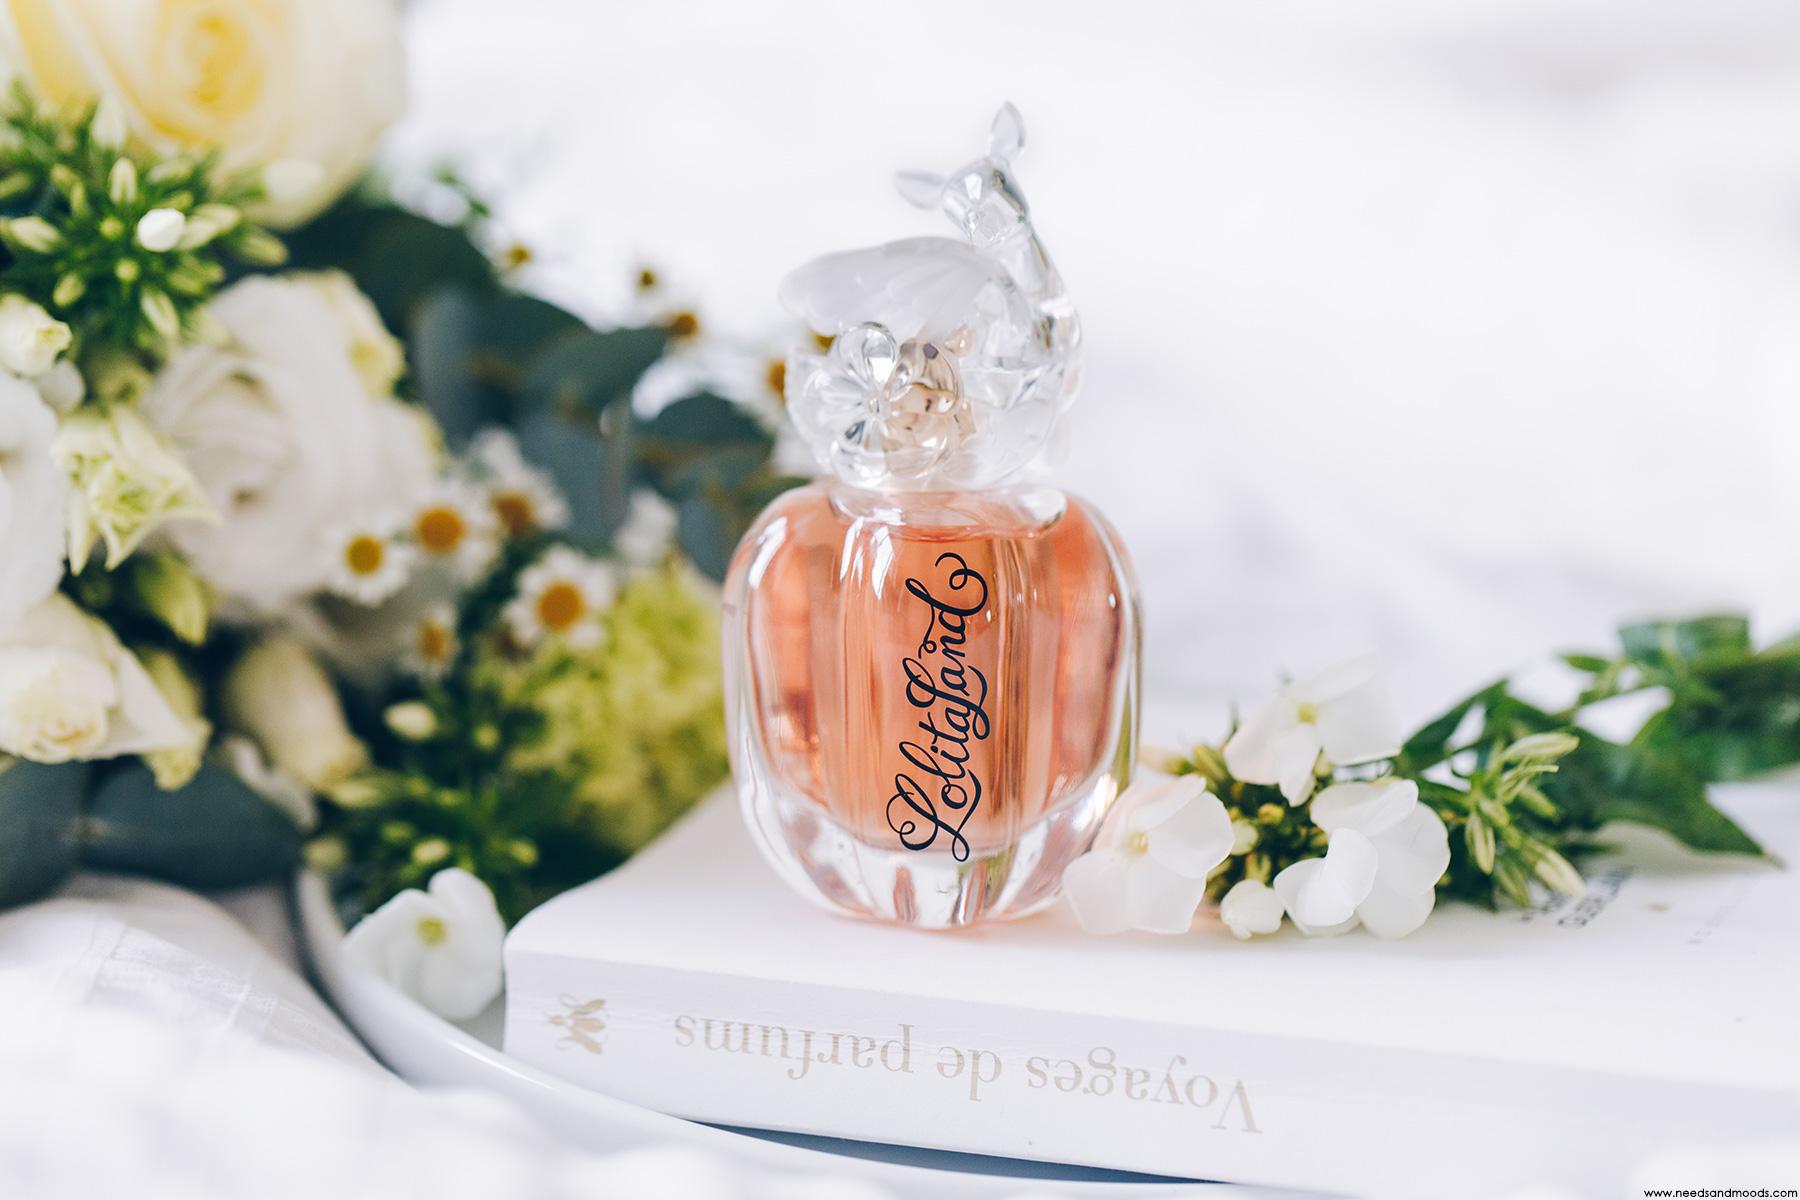 lolita lempicka parfum lolitaland